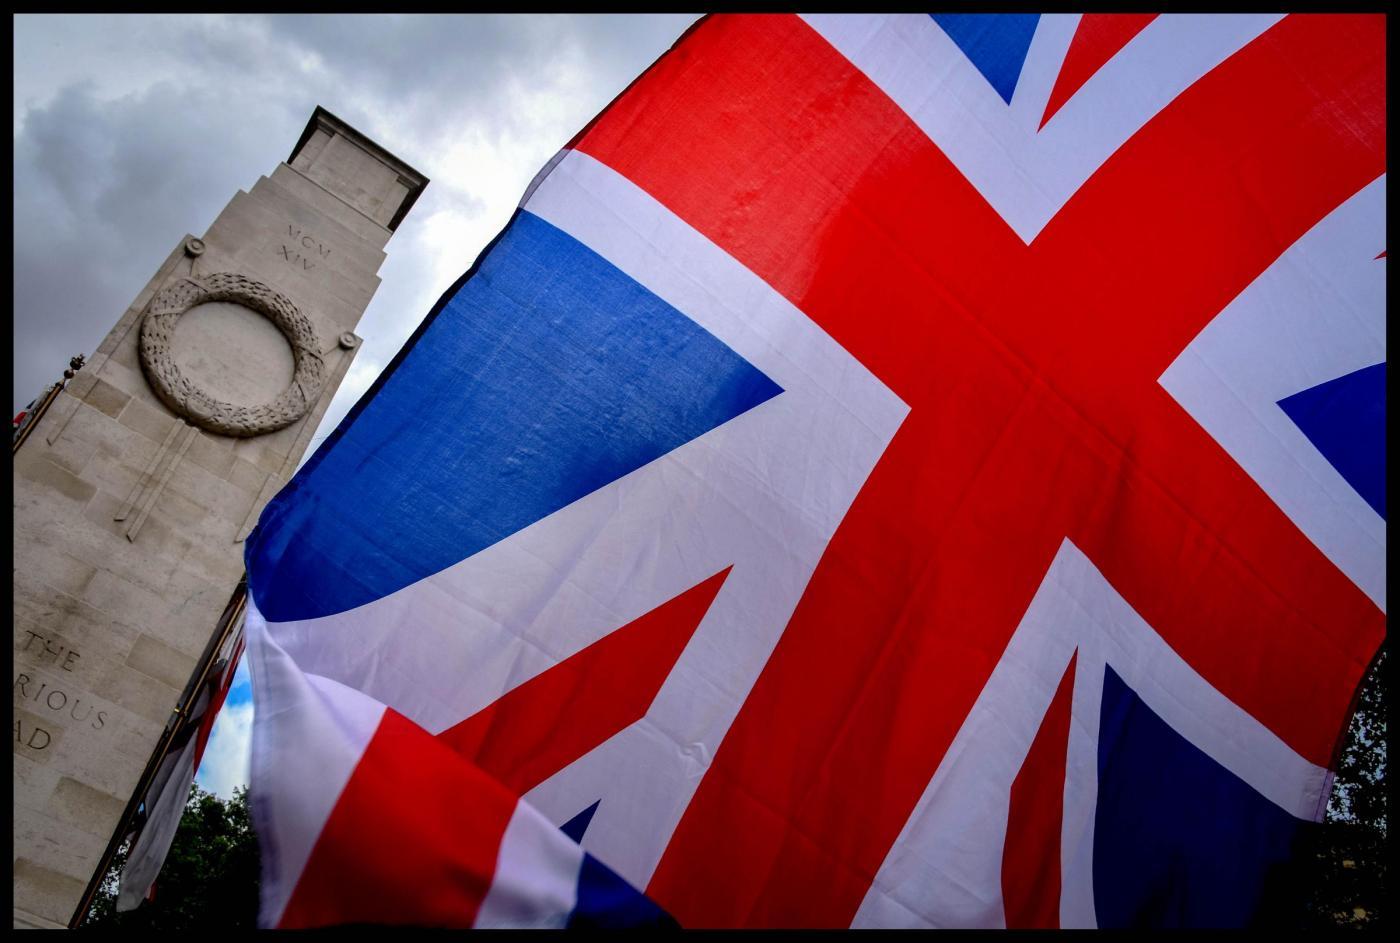 Ibernazione post-mortem di una 14enne: in Gran Bretagna la storica sentenza